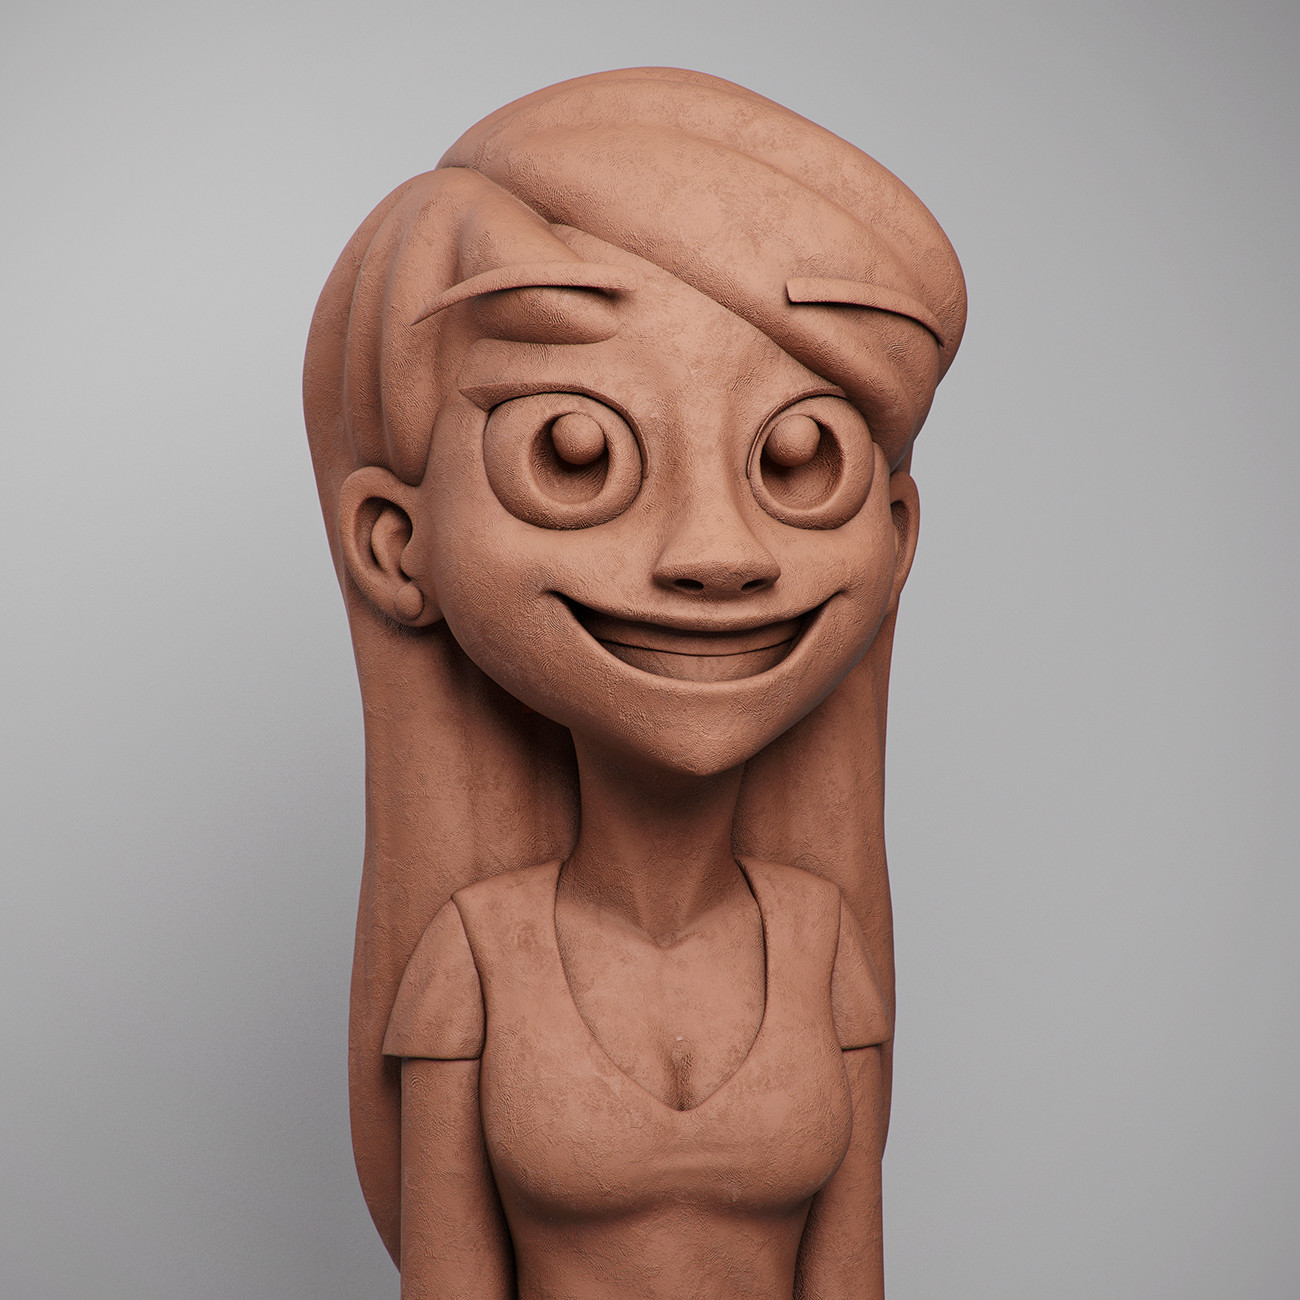 Digital 3D Art Artwork